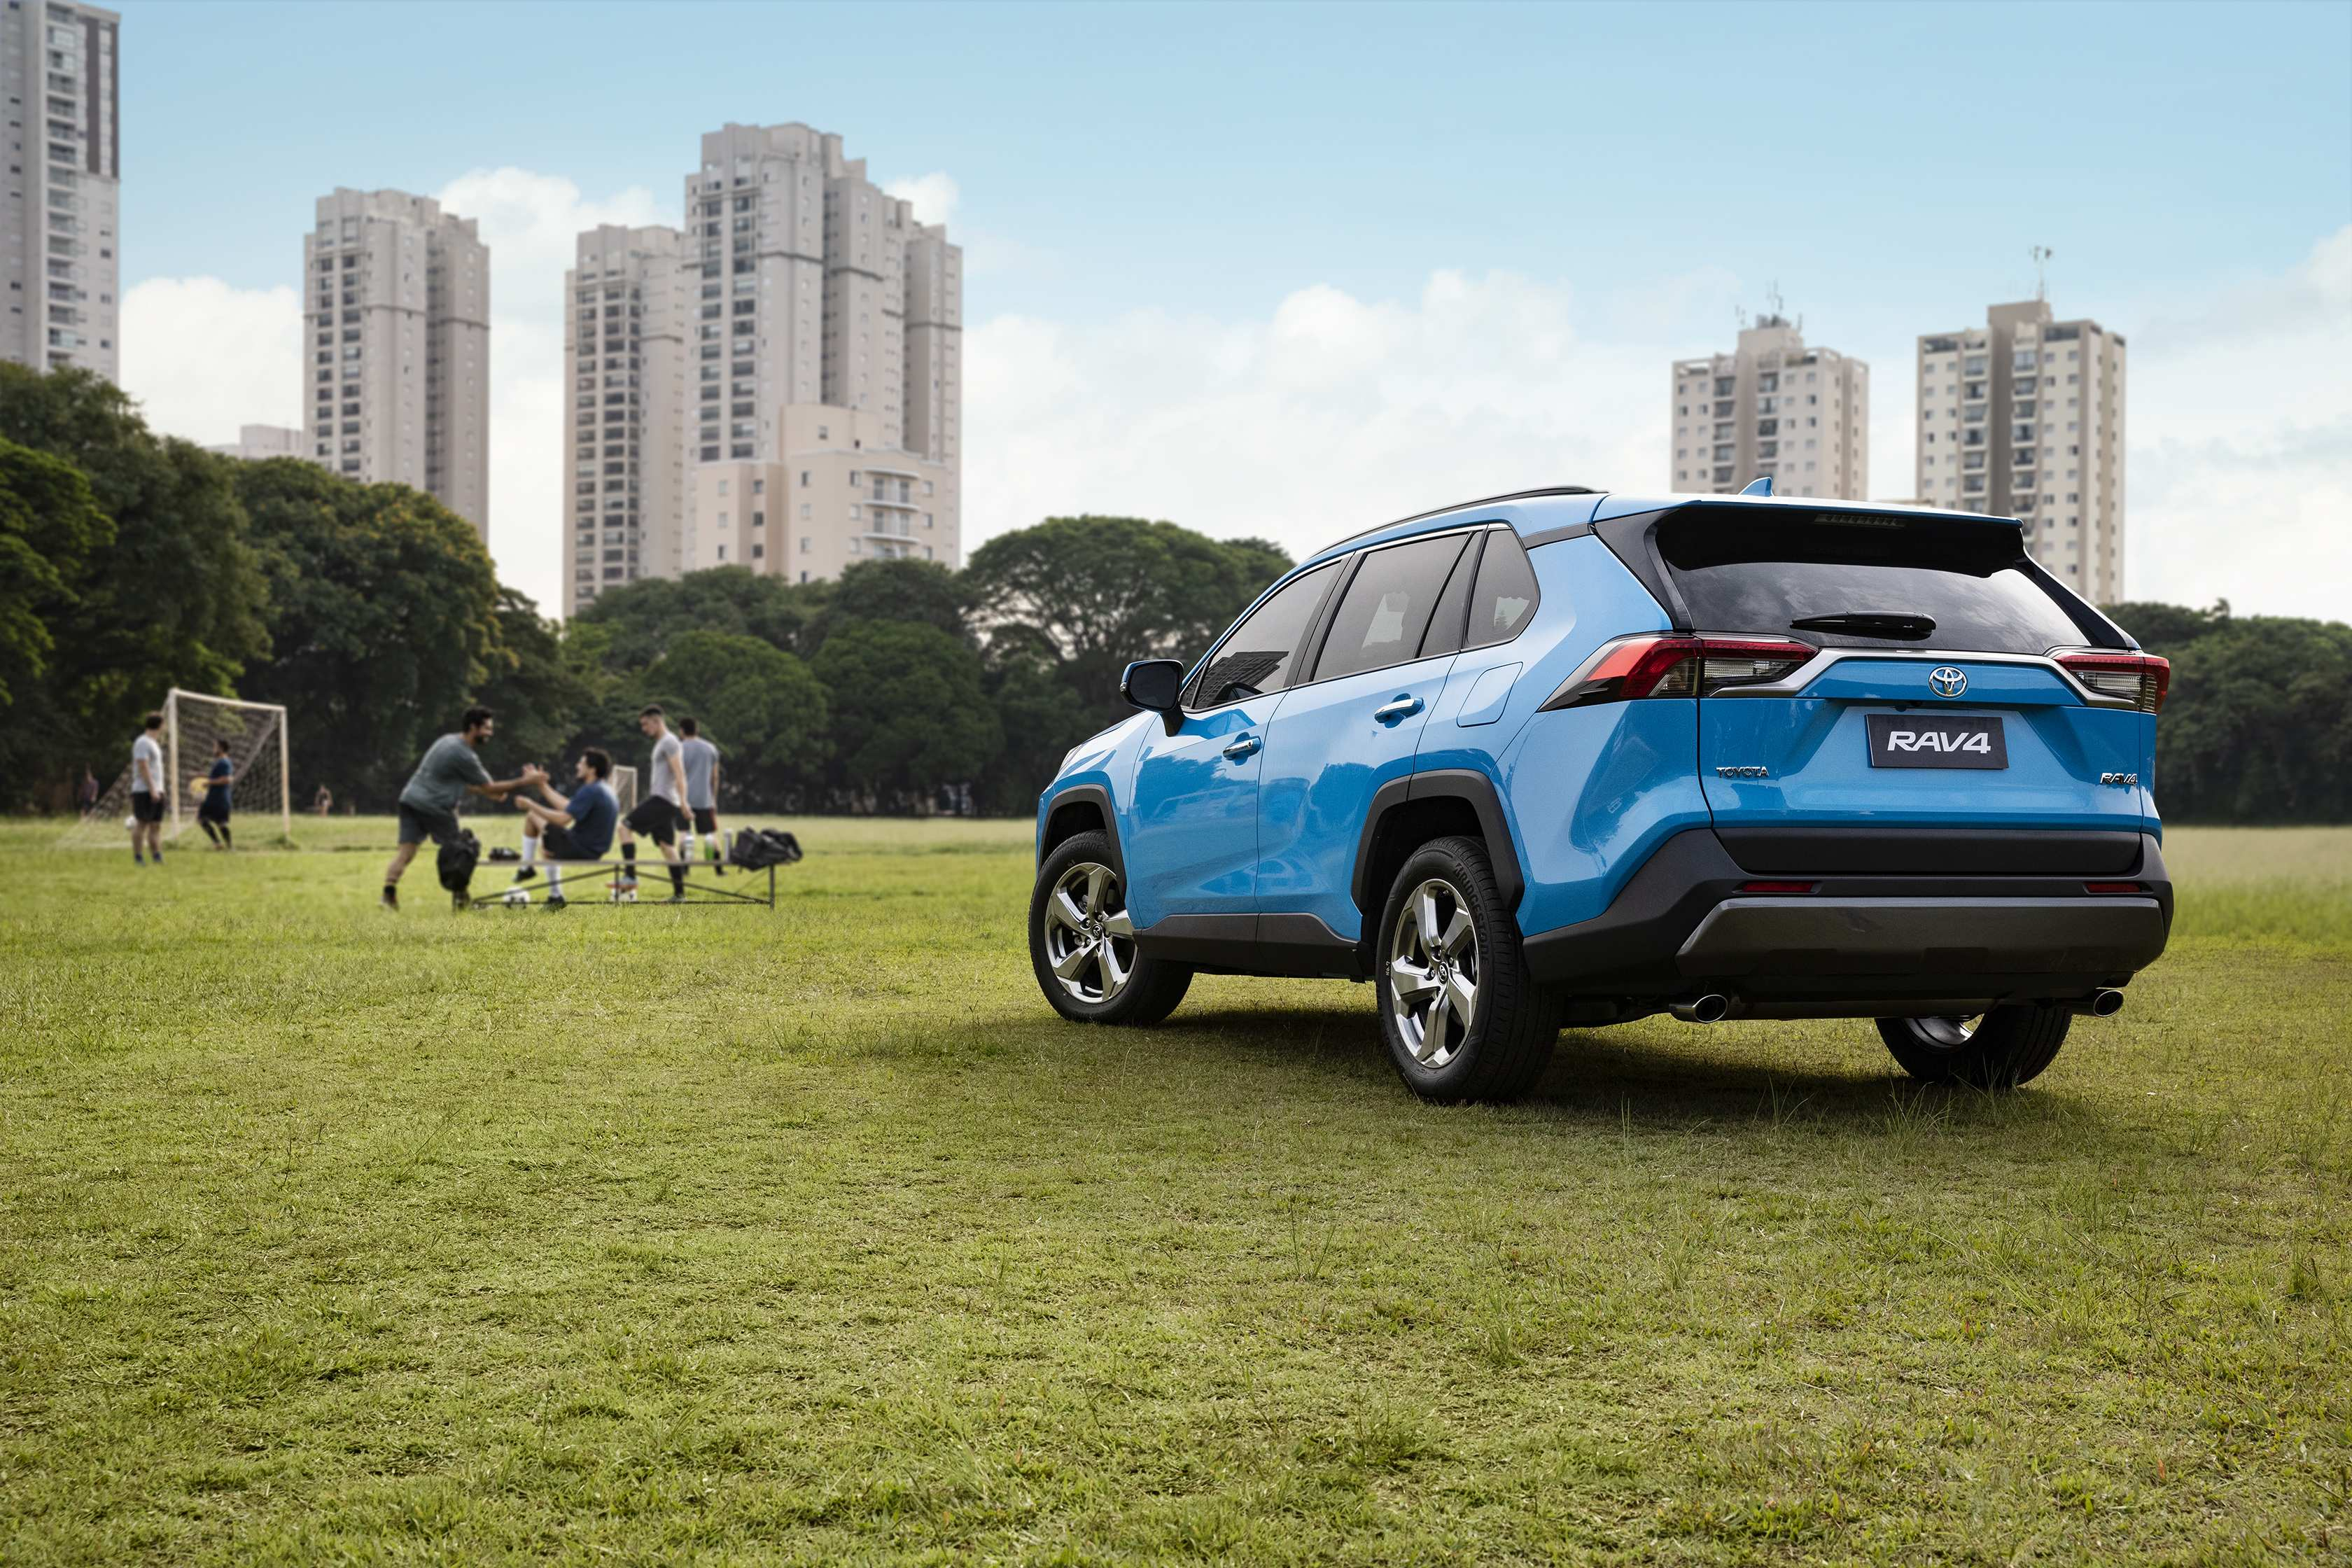 89 All New Toyota Jamaica 2020 Rav4 Speed Test with Toyota Jamaica 2020 Rav4